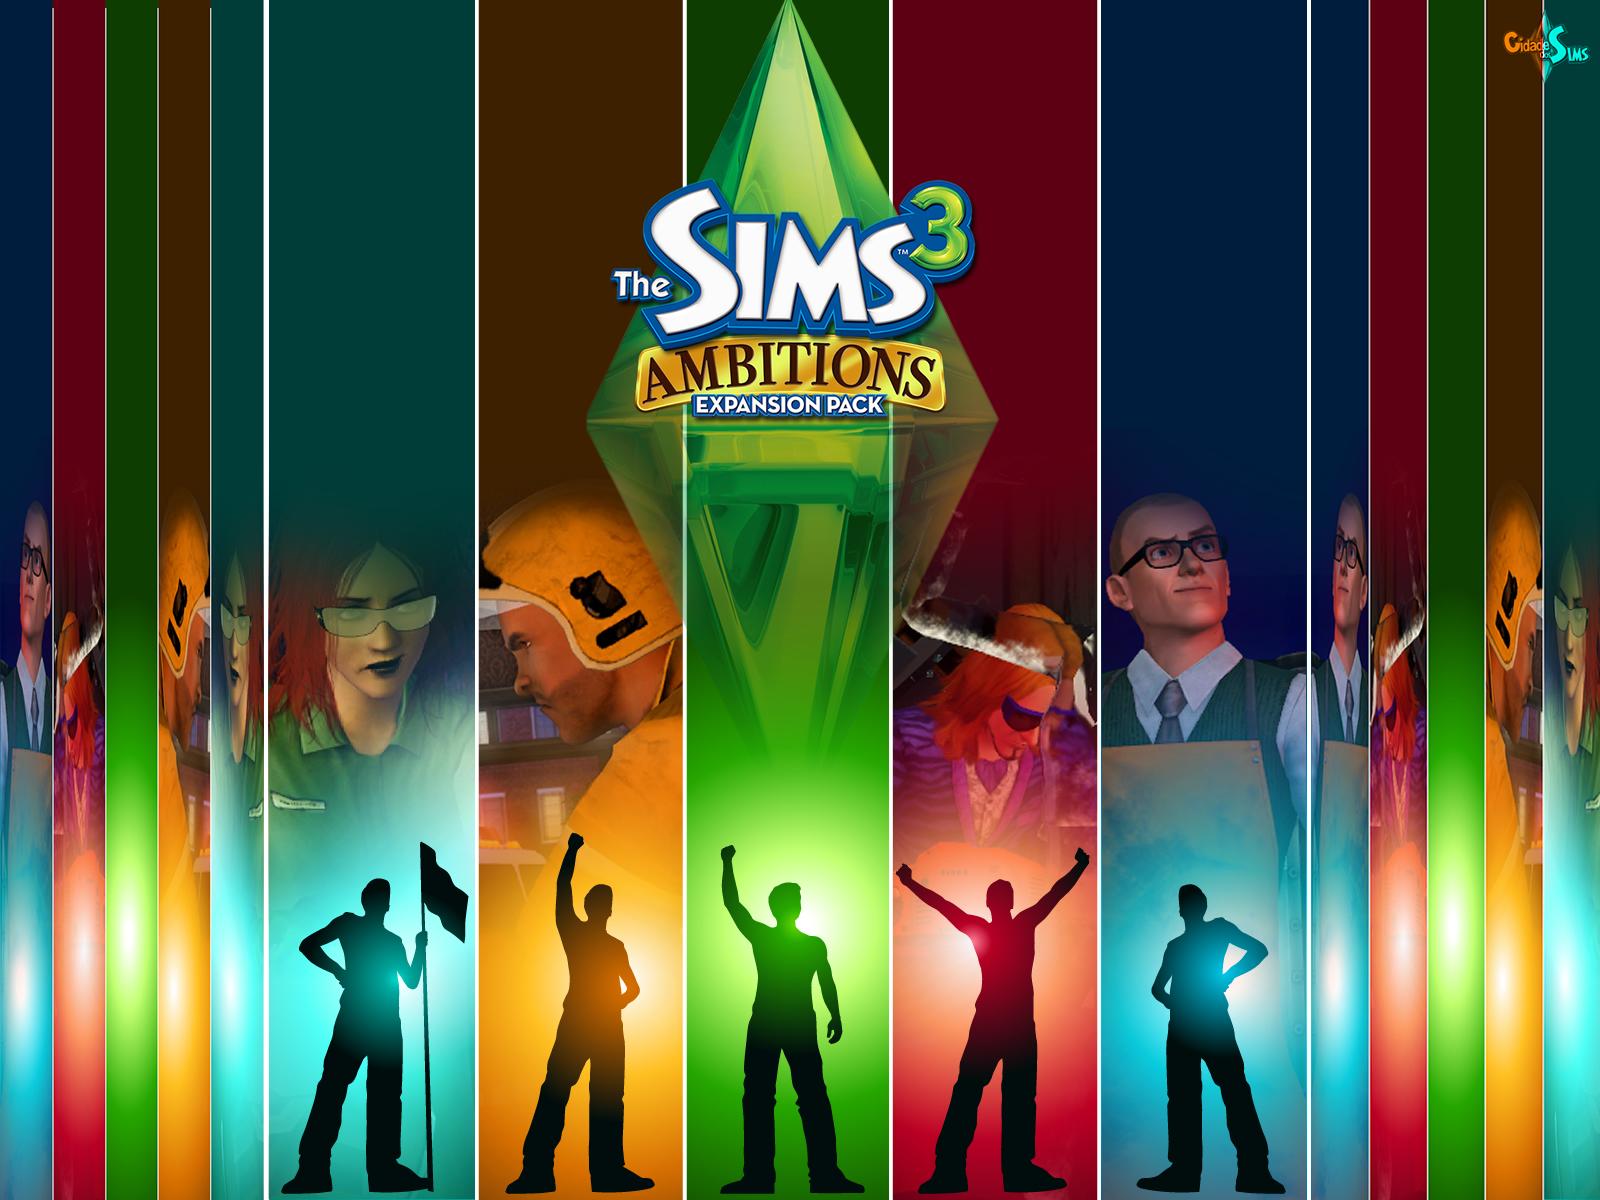 Happy Wallpaper The Sims 3 Wallpaper